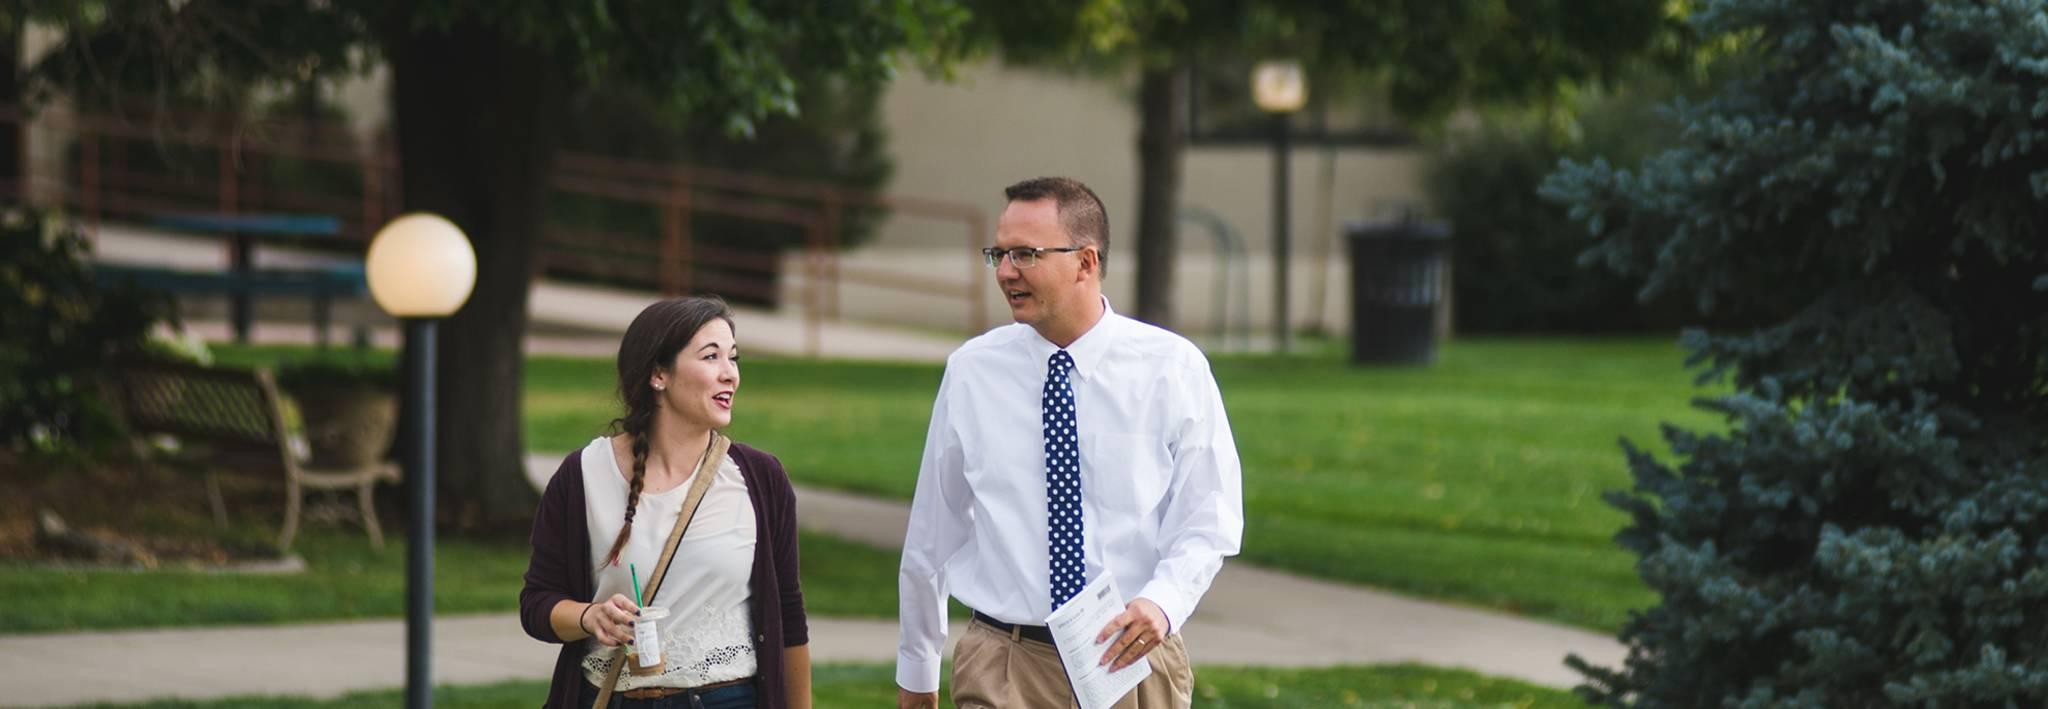 Matt Jones, CCU professor, walking with a student through campus.